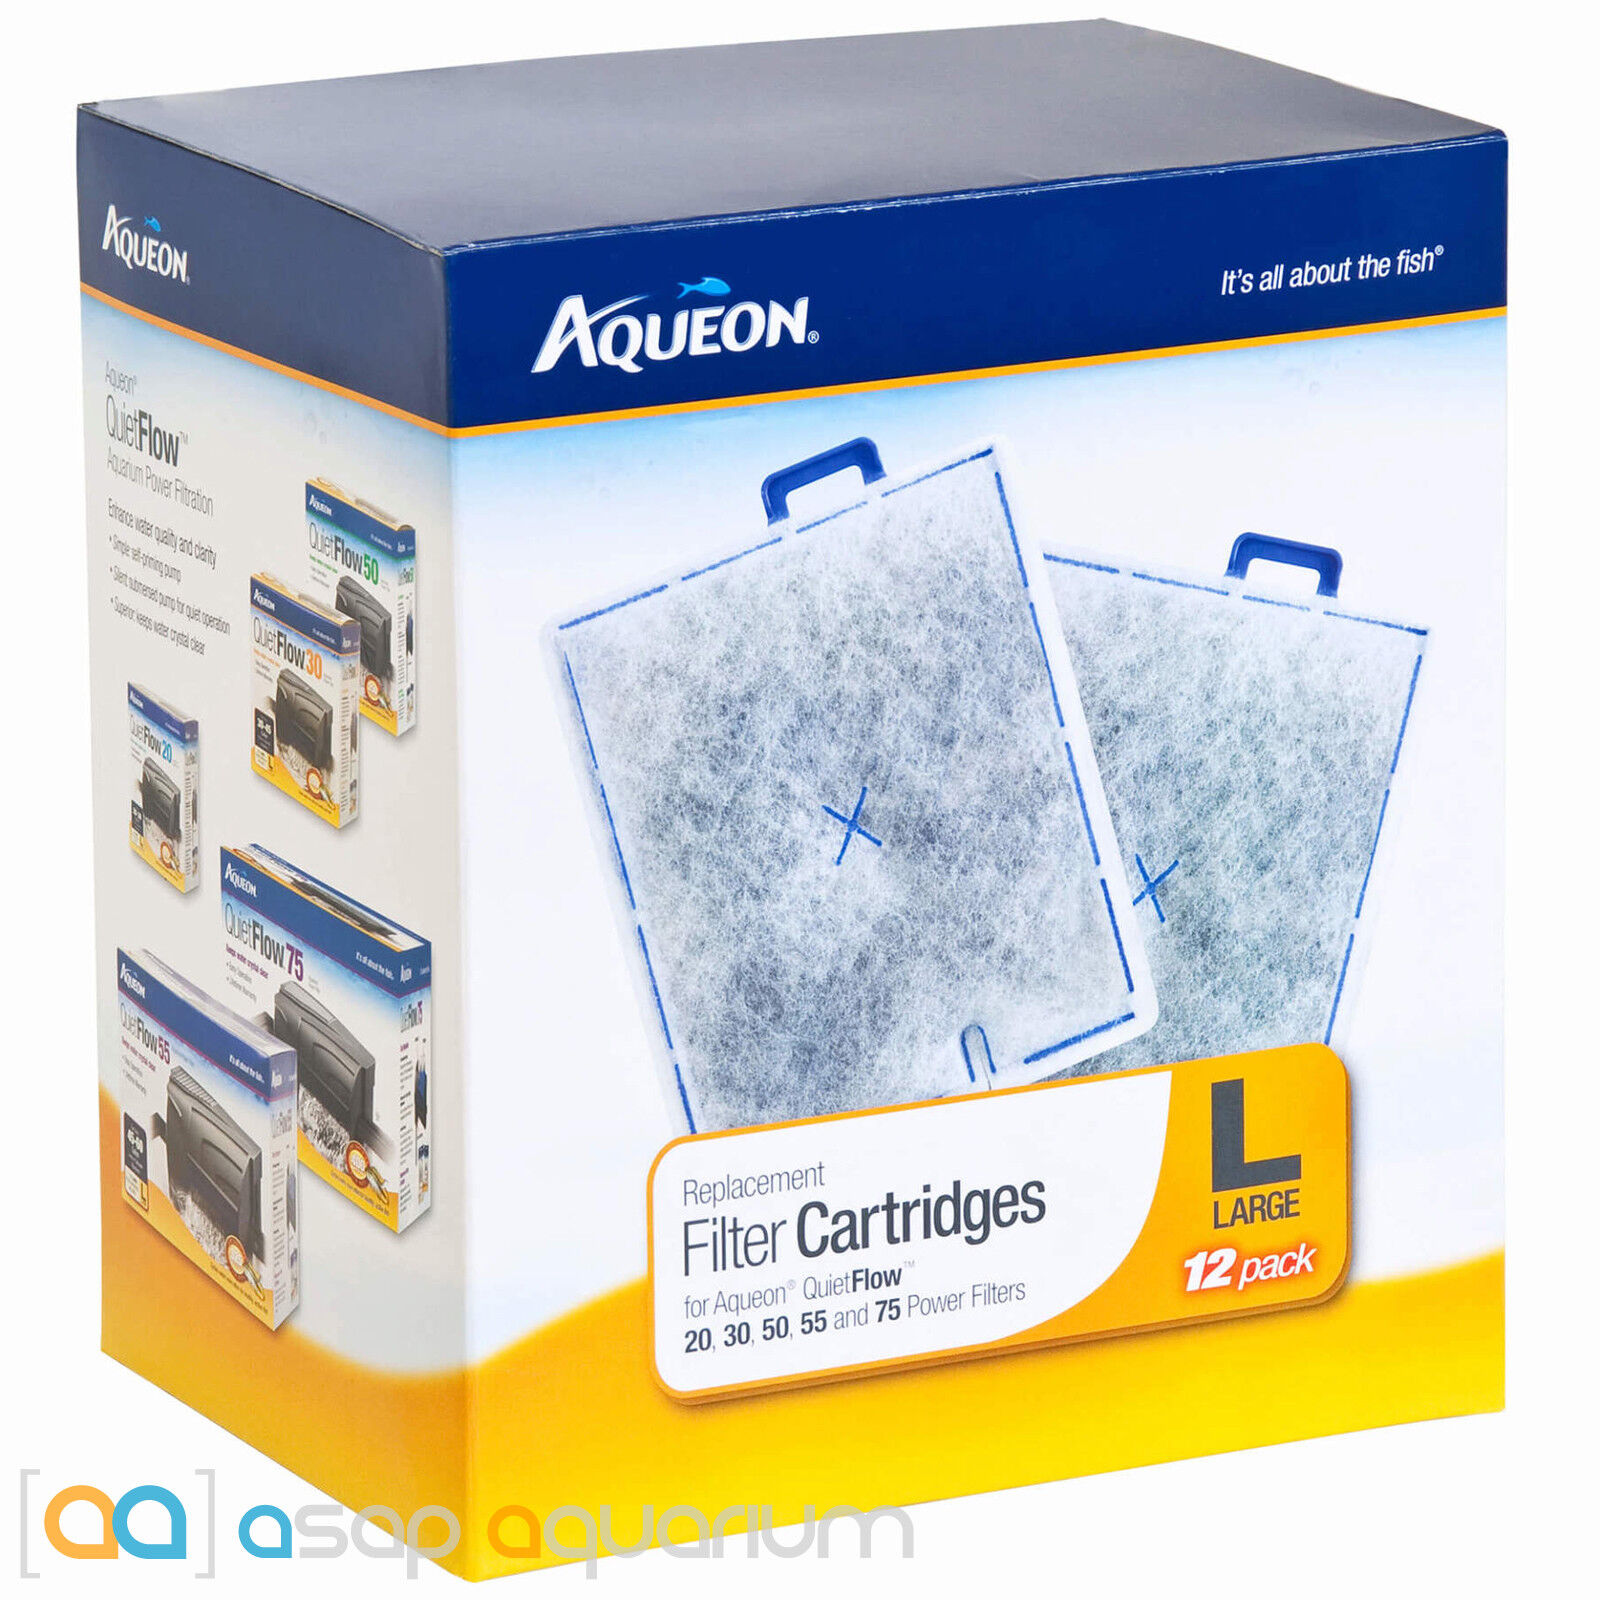 Aqueon Replacement Filter Cartridges, Medium, Pack of 12